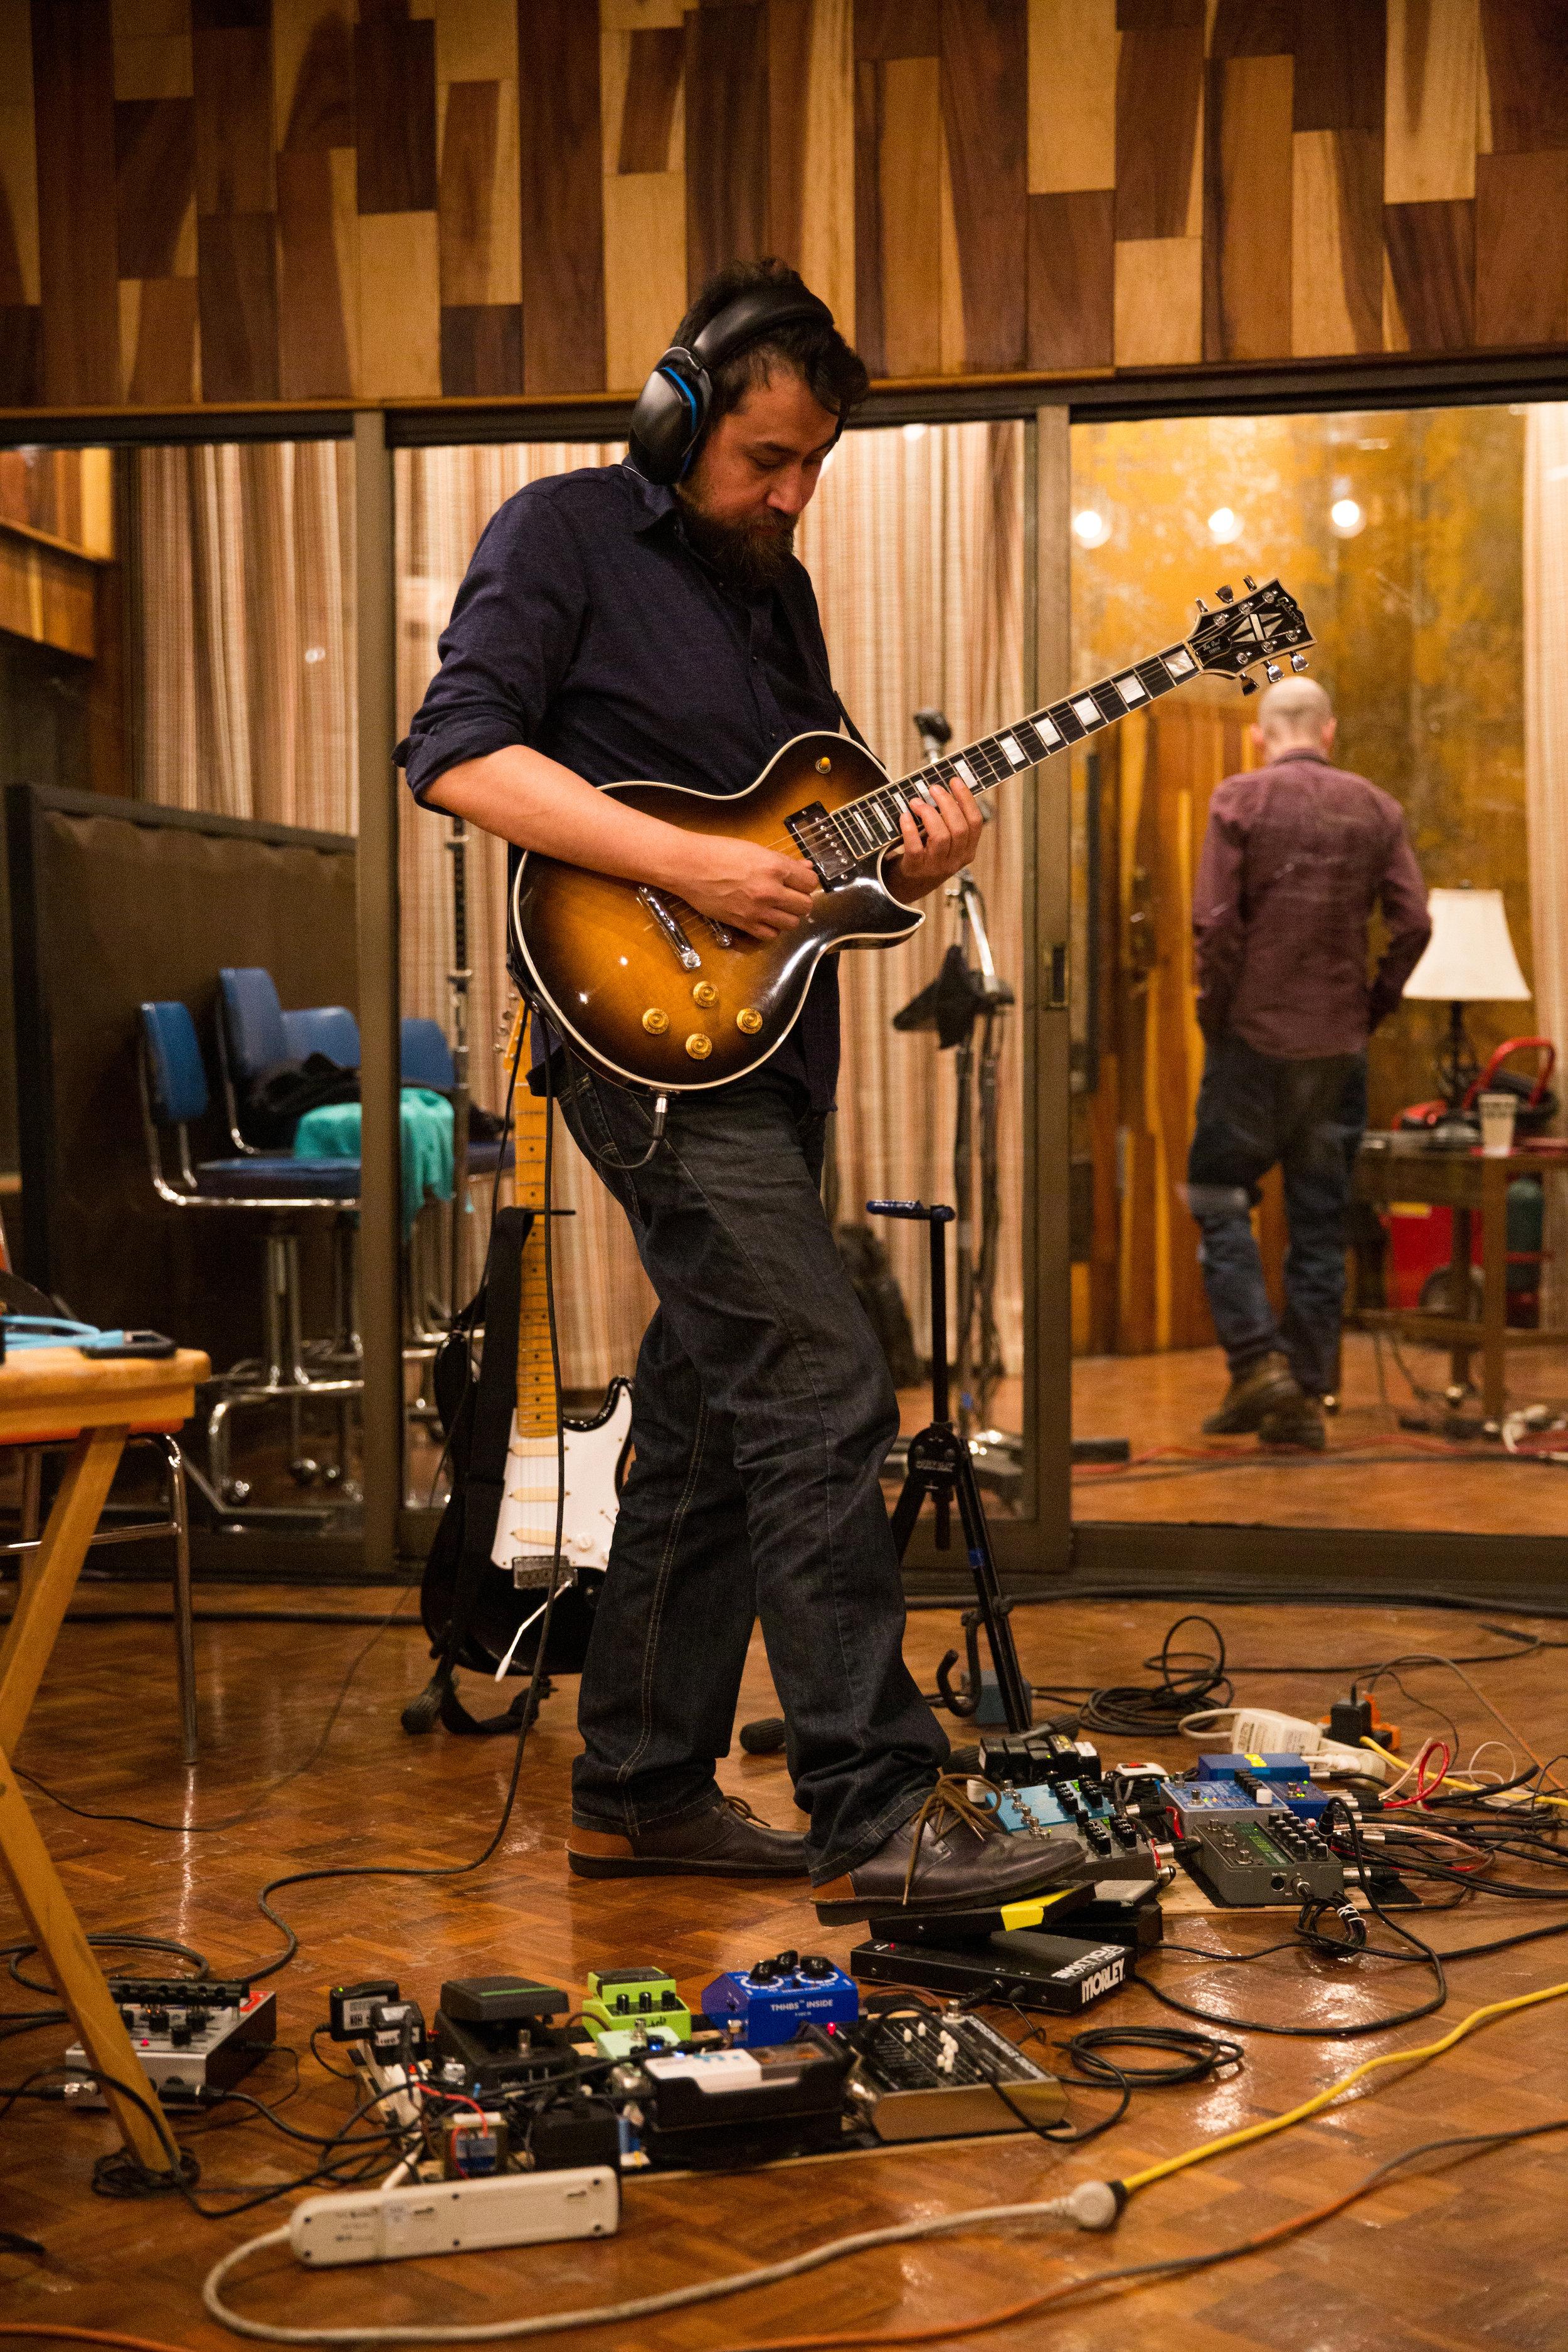 Kristian grabando sus excelsas guitarras.